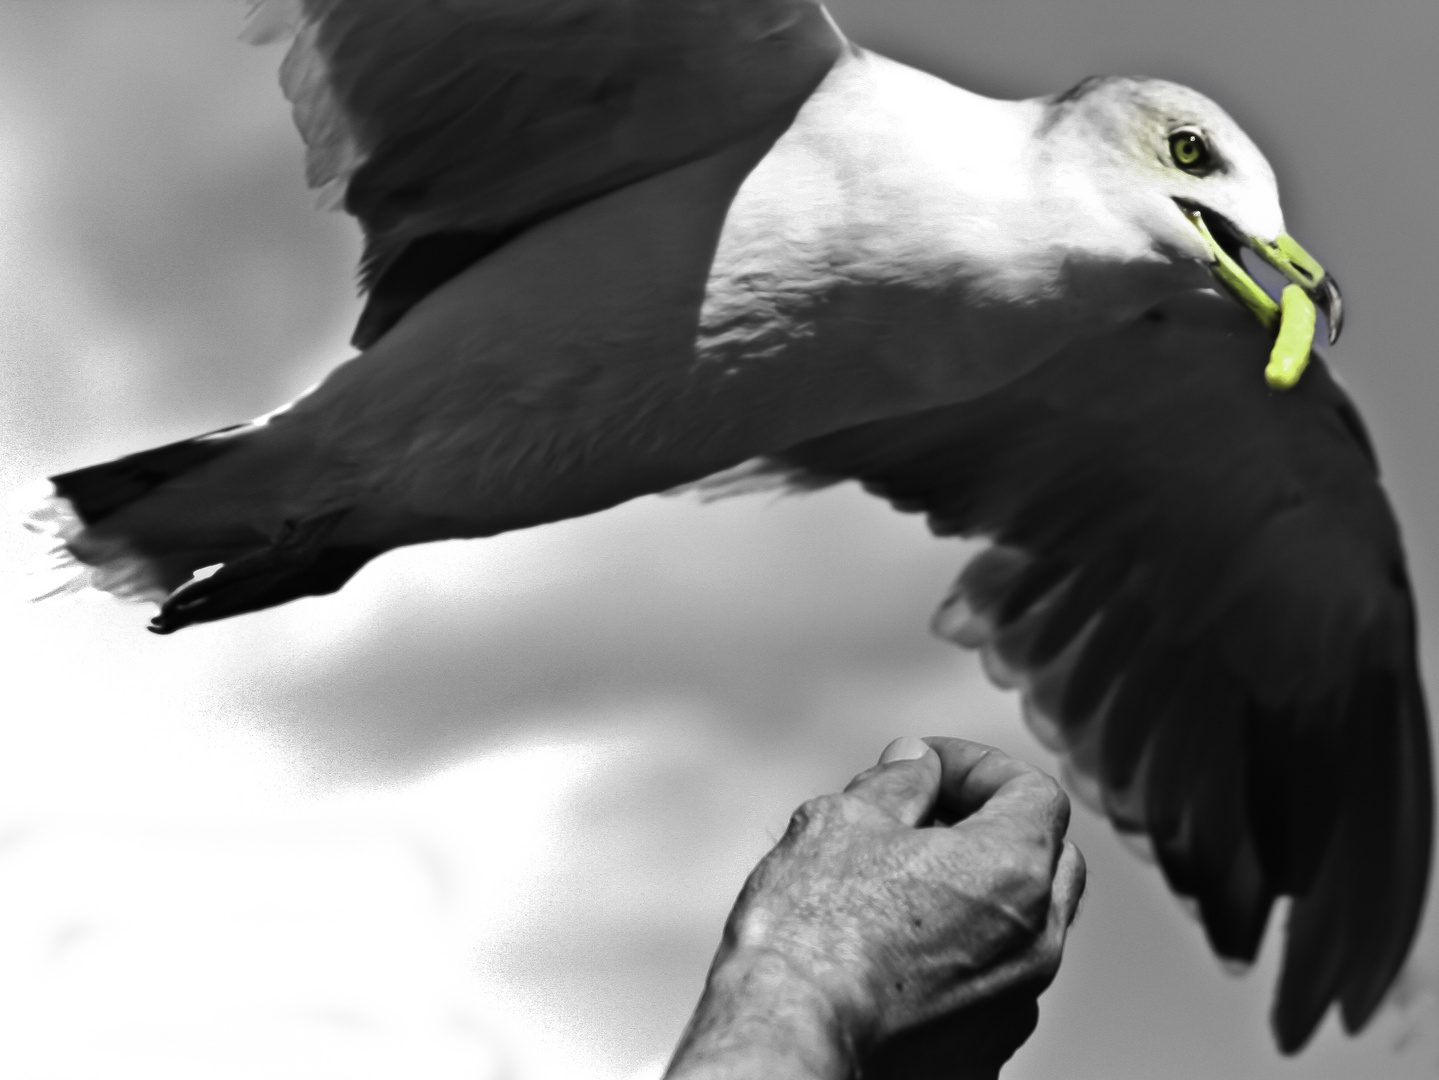 Catcher in the Flye